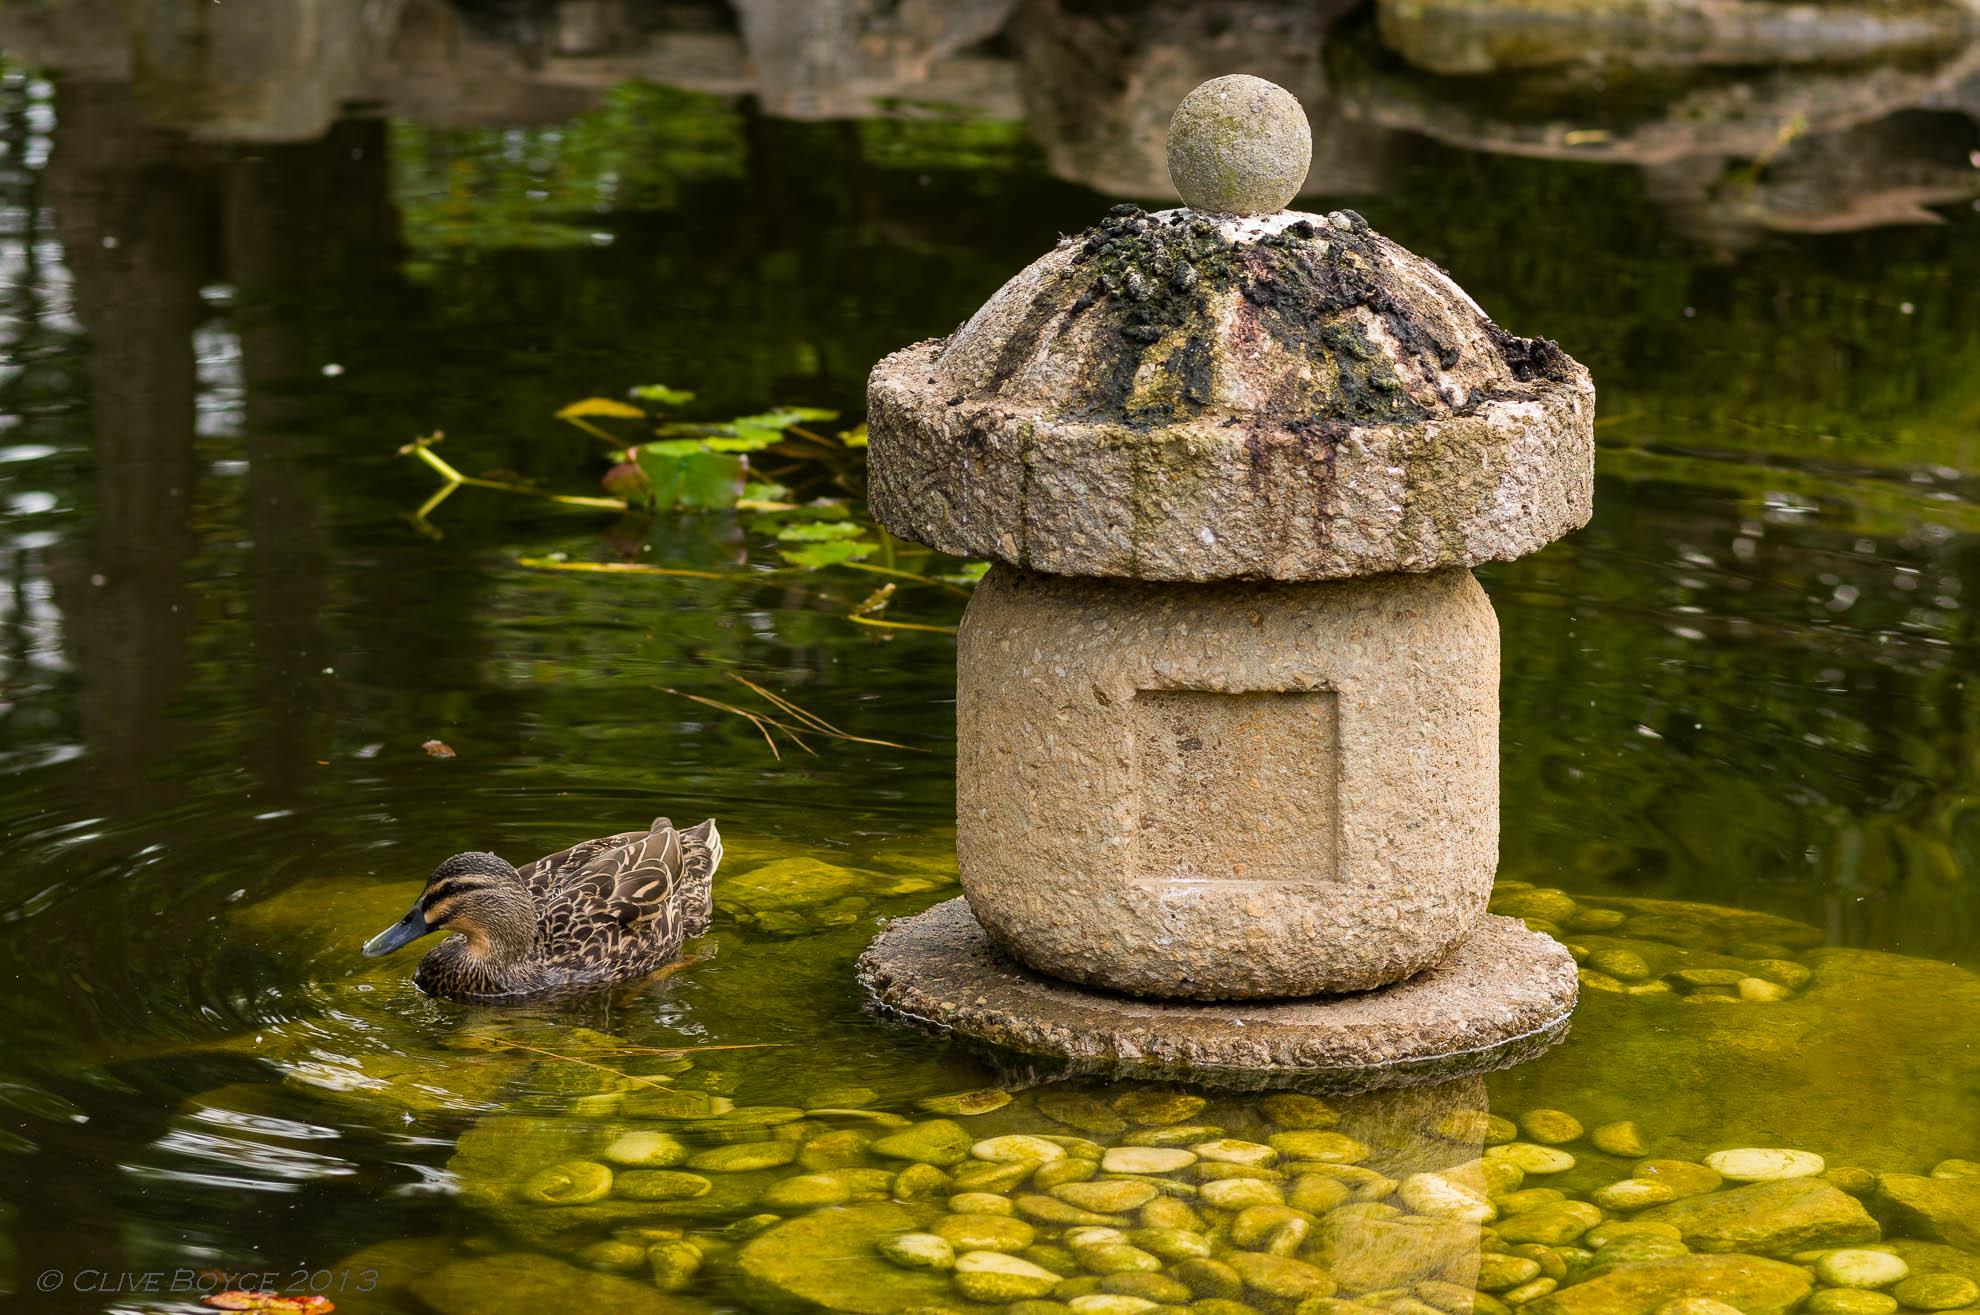 Himeji Garden, Adelaide